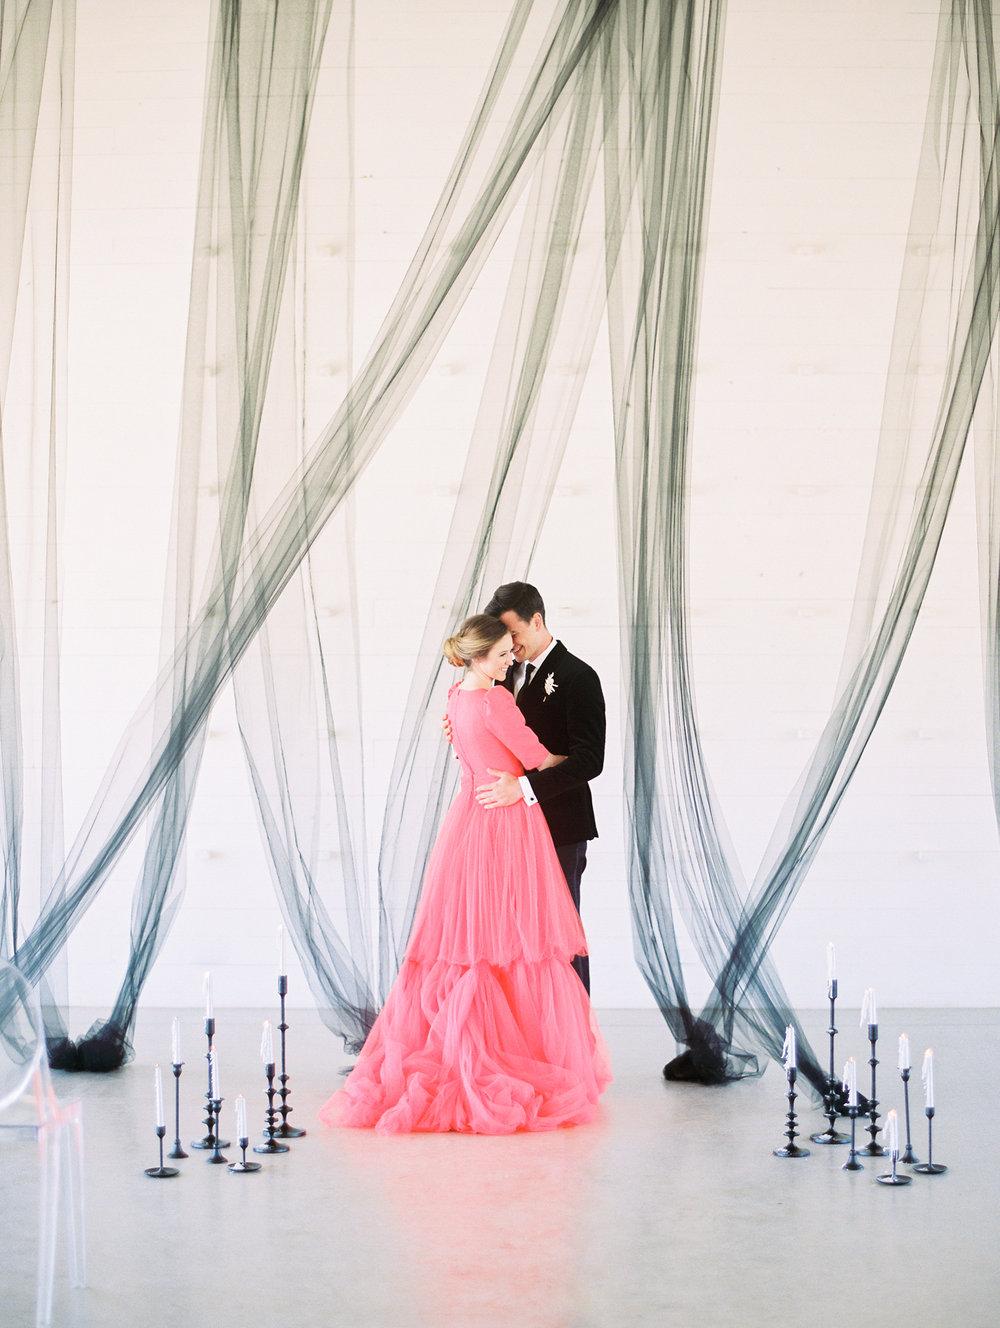 Kristin-La-Voie-Photography-Austin-Wedding-Photographer-Prospect-House-77.jpg